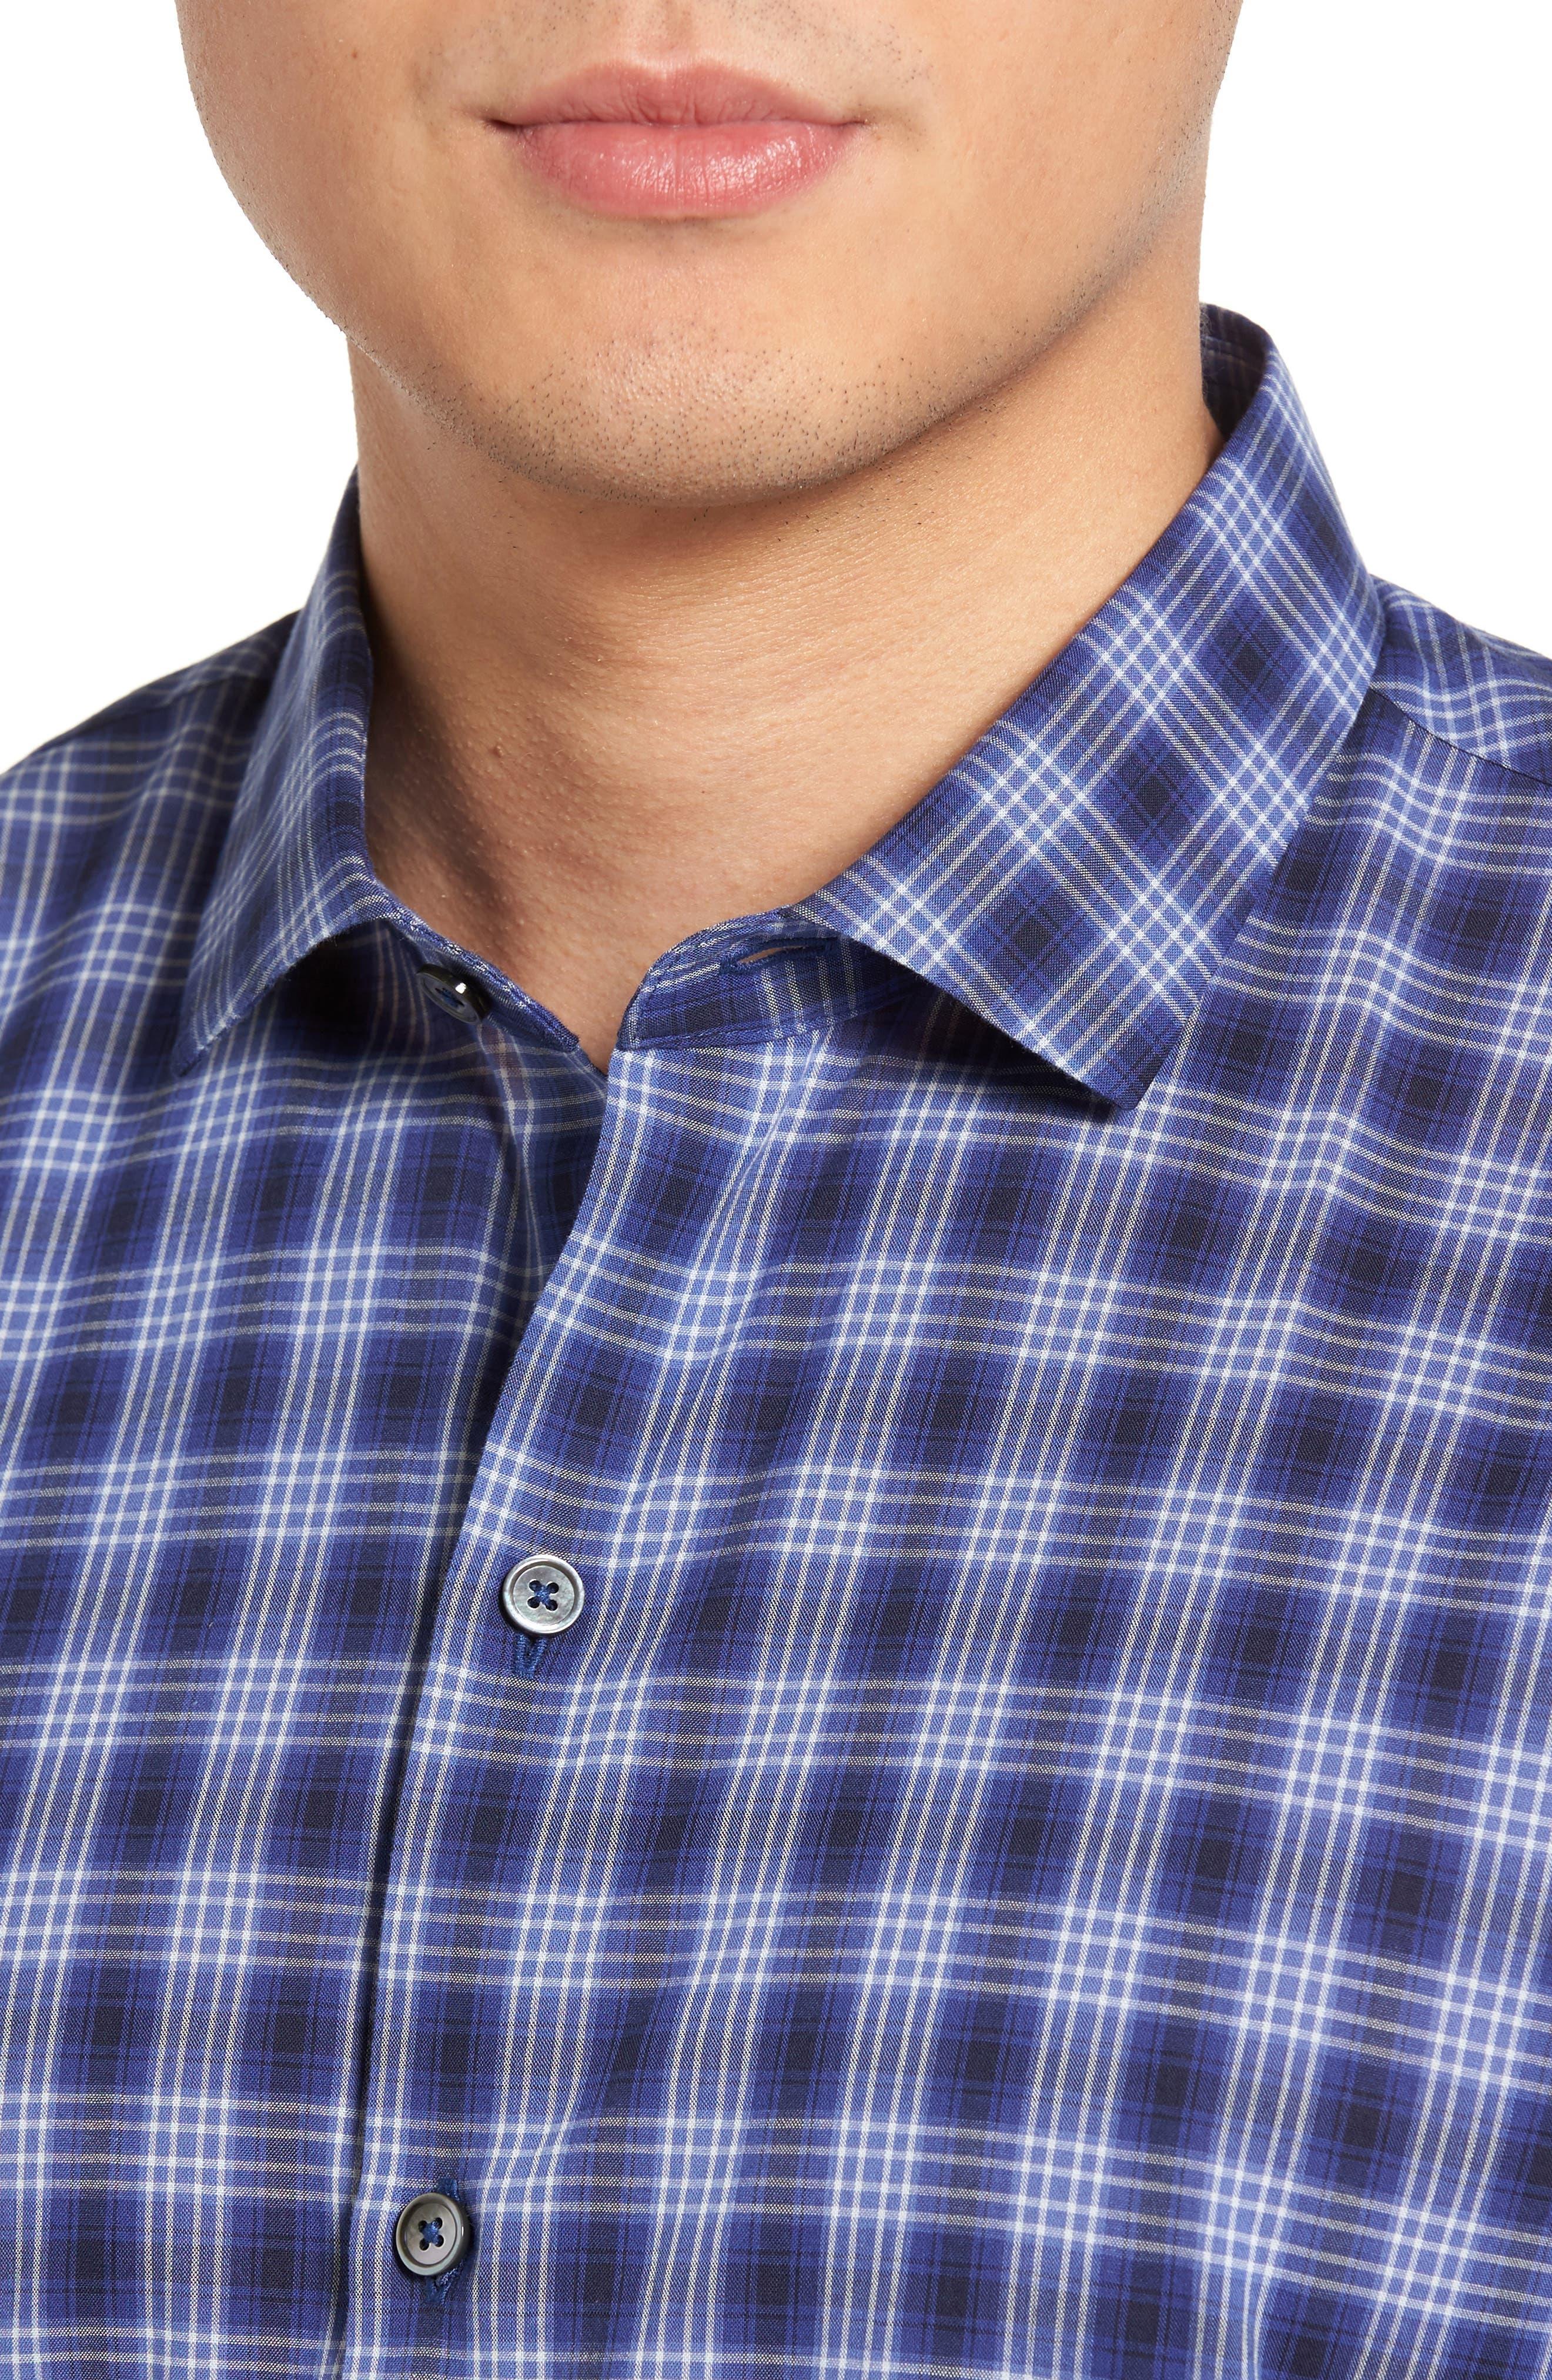 Medina Slim Fit Plaid Sport Shirt,                             Alternate thumbnail 4, color,                             Pacific